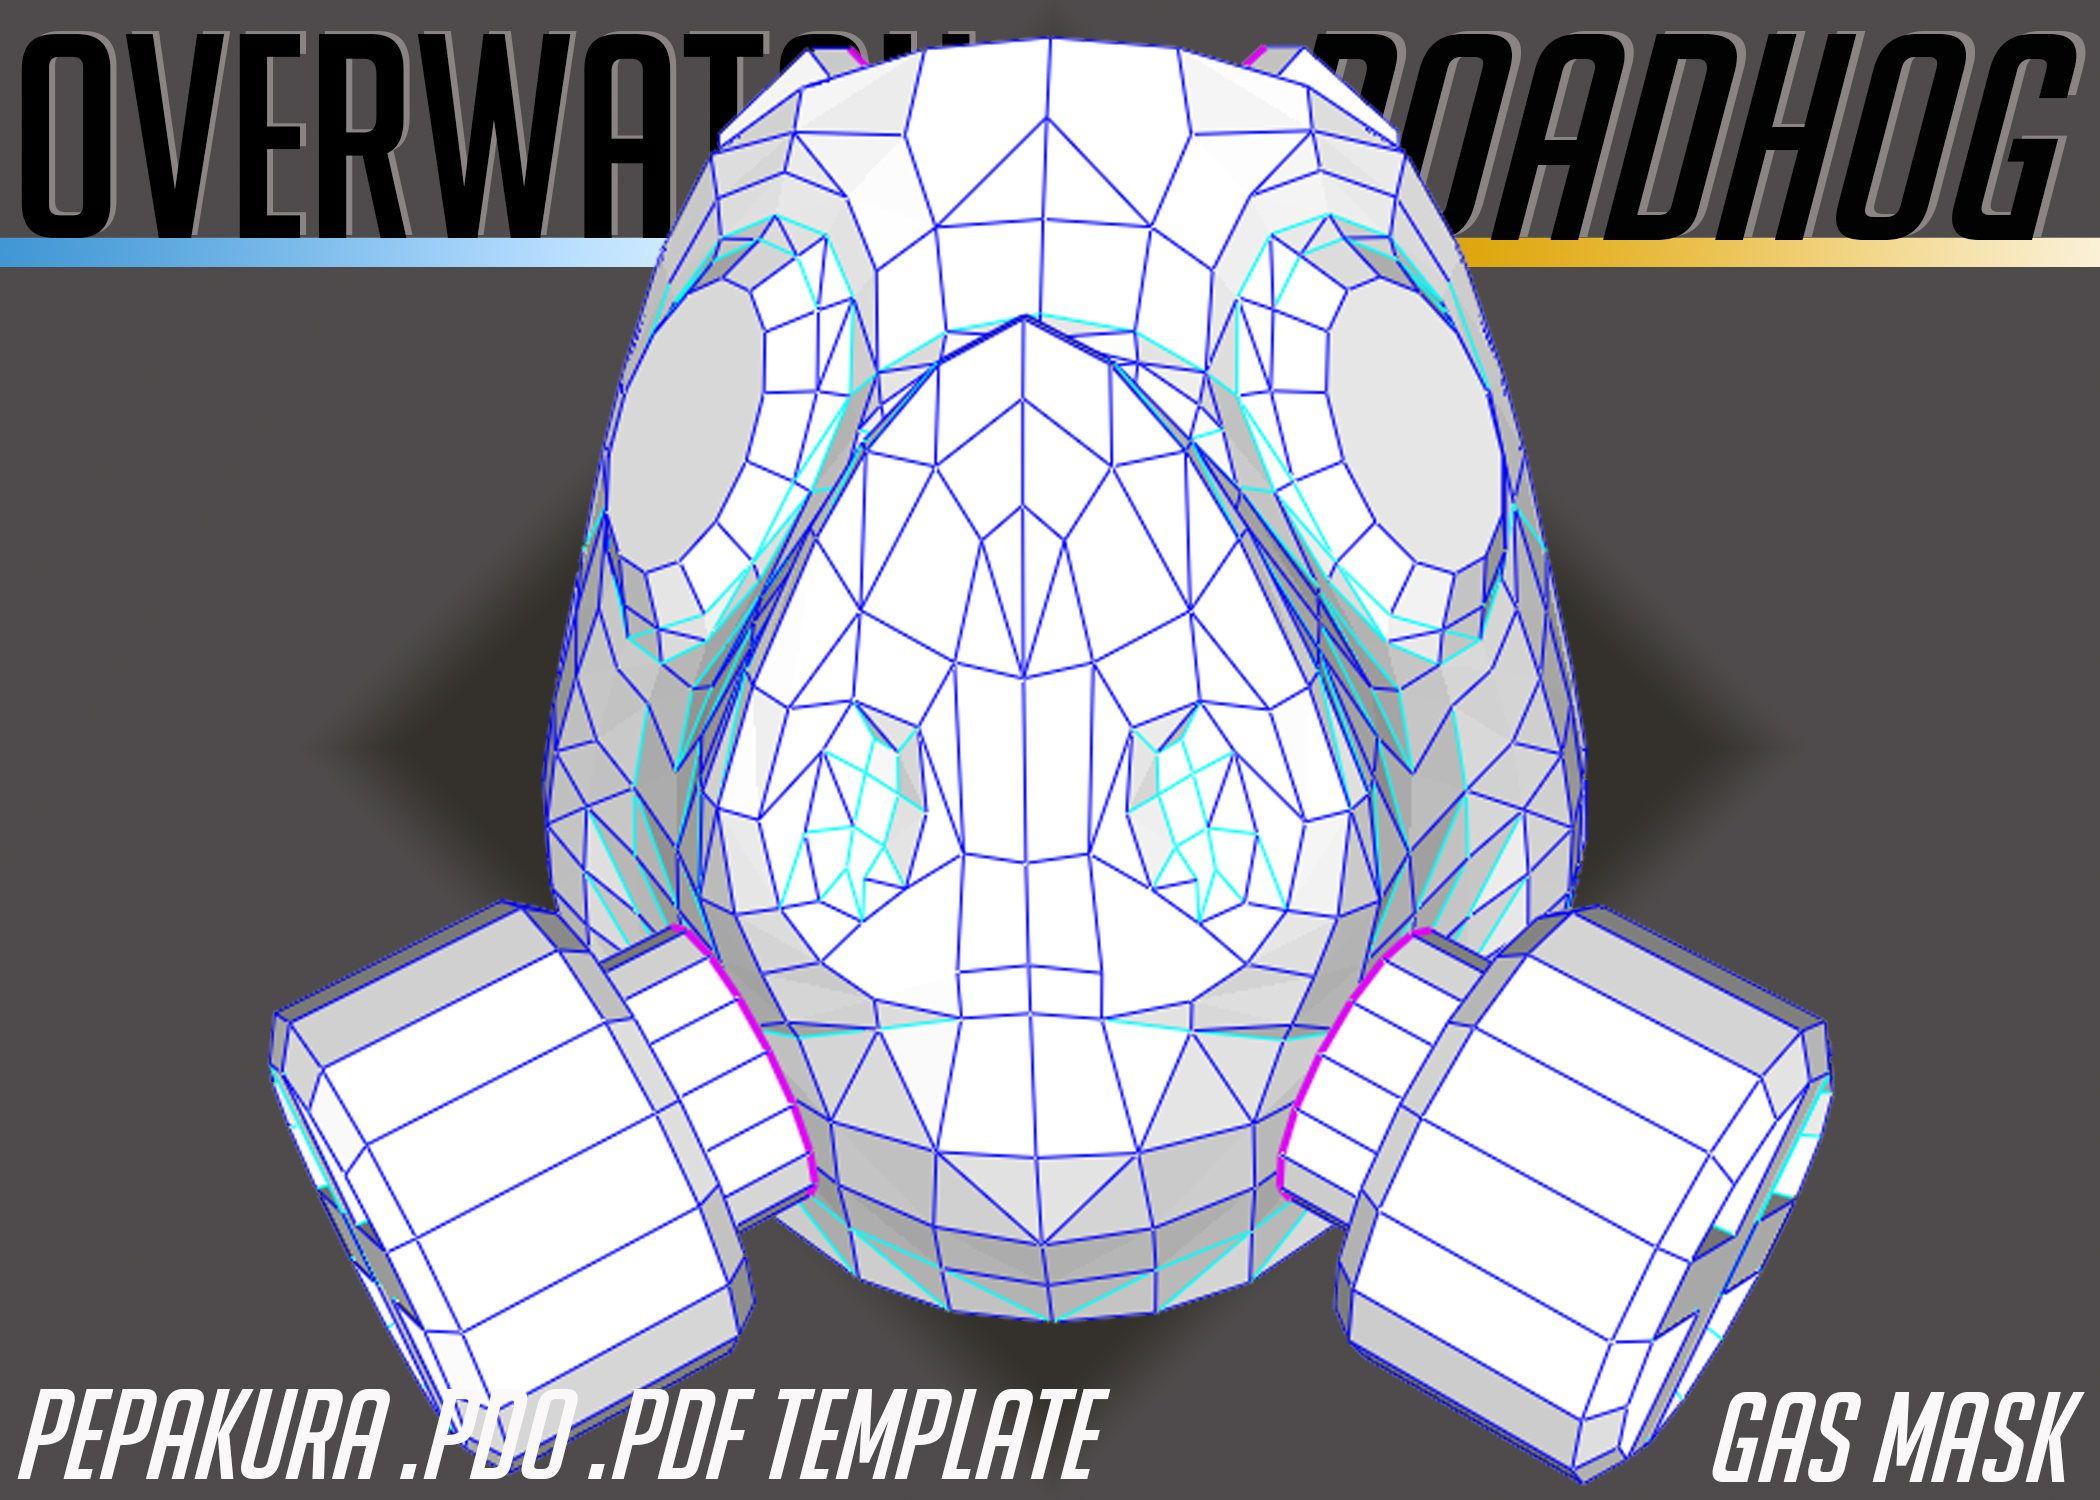 Overwatch Roadhog Gas Mask Pepakura Cosplay Template  PDO